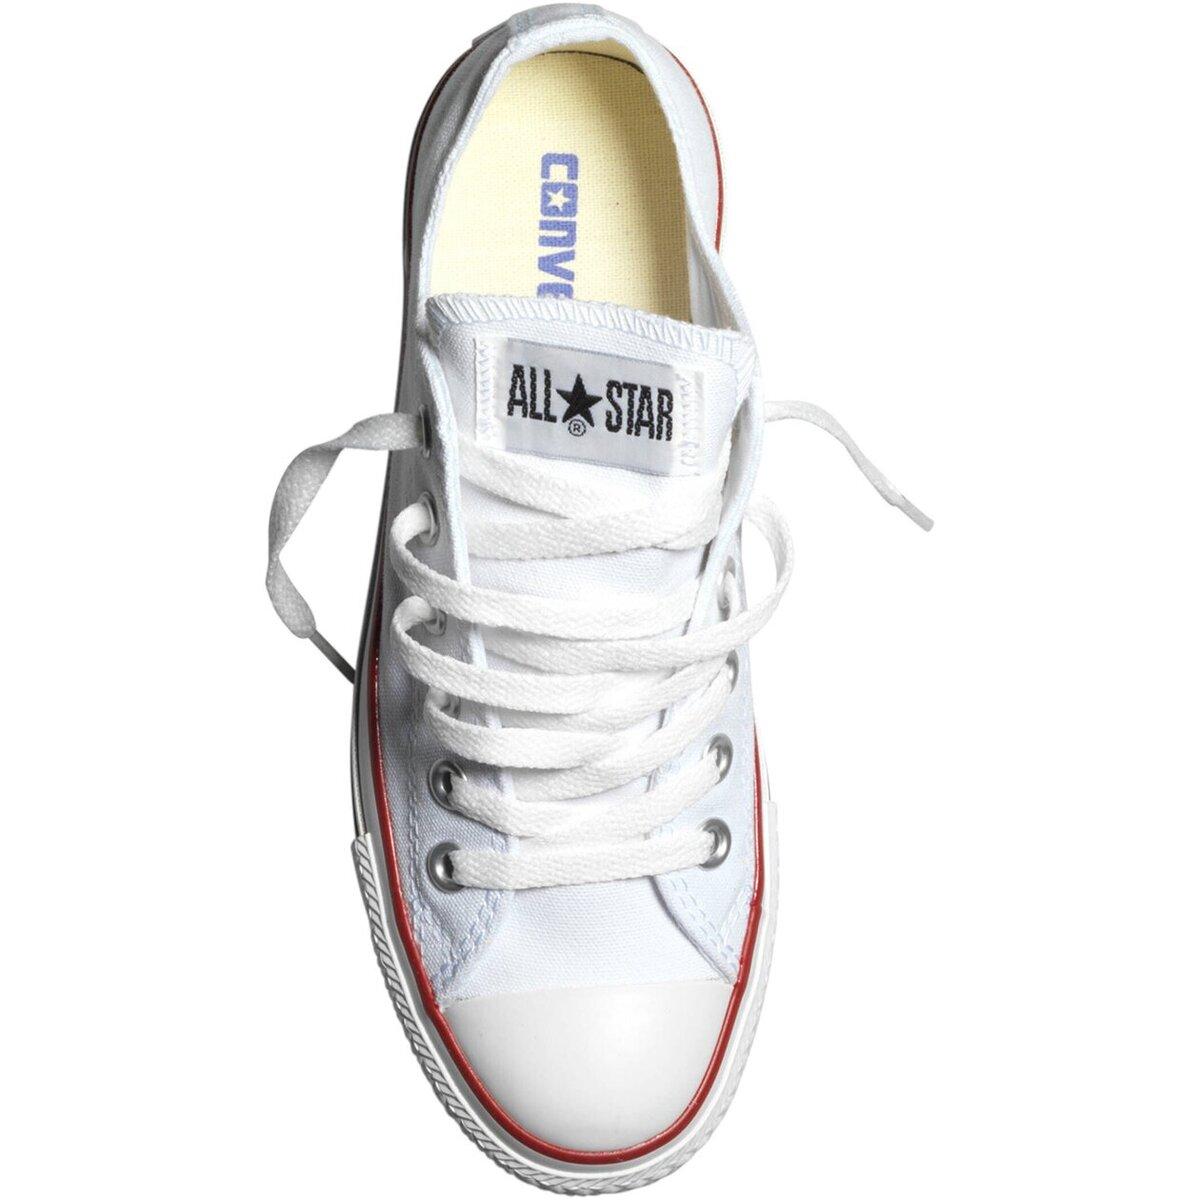 Bild 5 von CONVERSE Sneaker AS Core OX - optical white